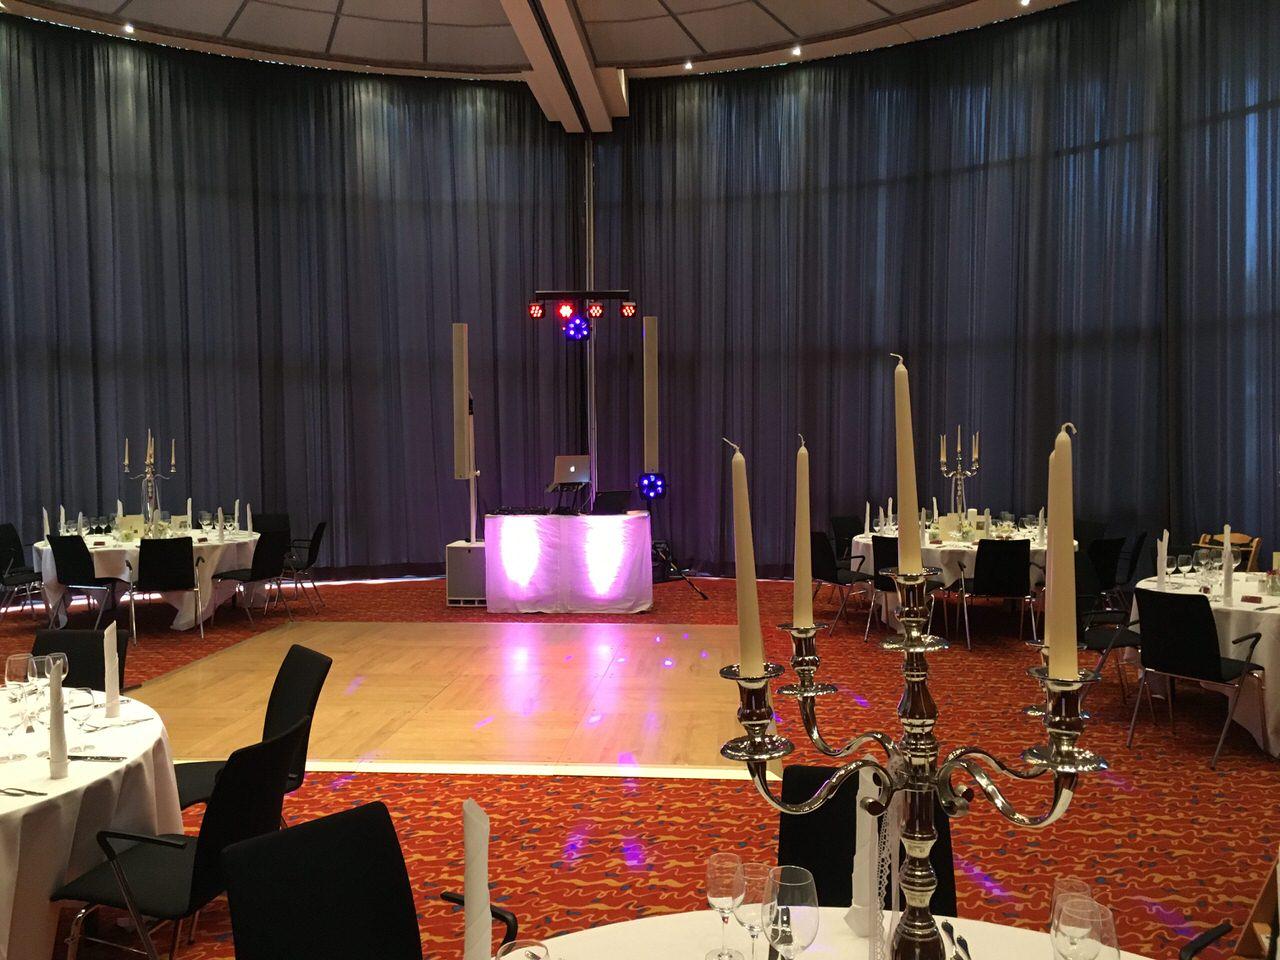 Aufbau der Anlage im Dorint Parkhotel Bad Neuenahr. Foto÷ Andreas Paul / Paul van Groove